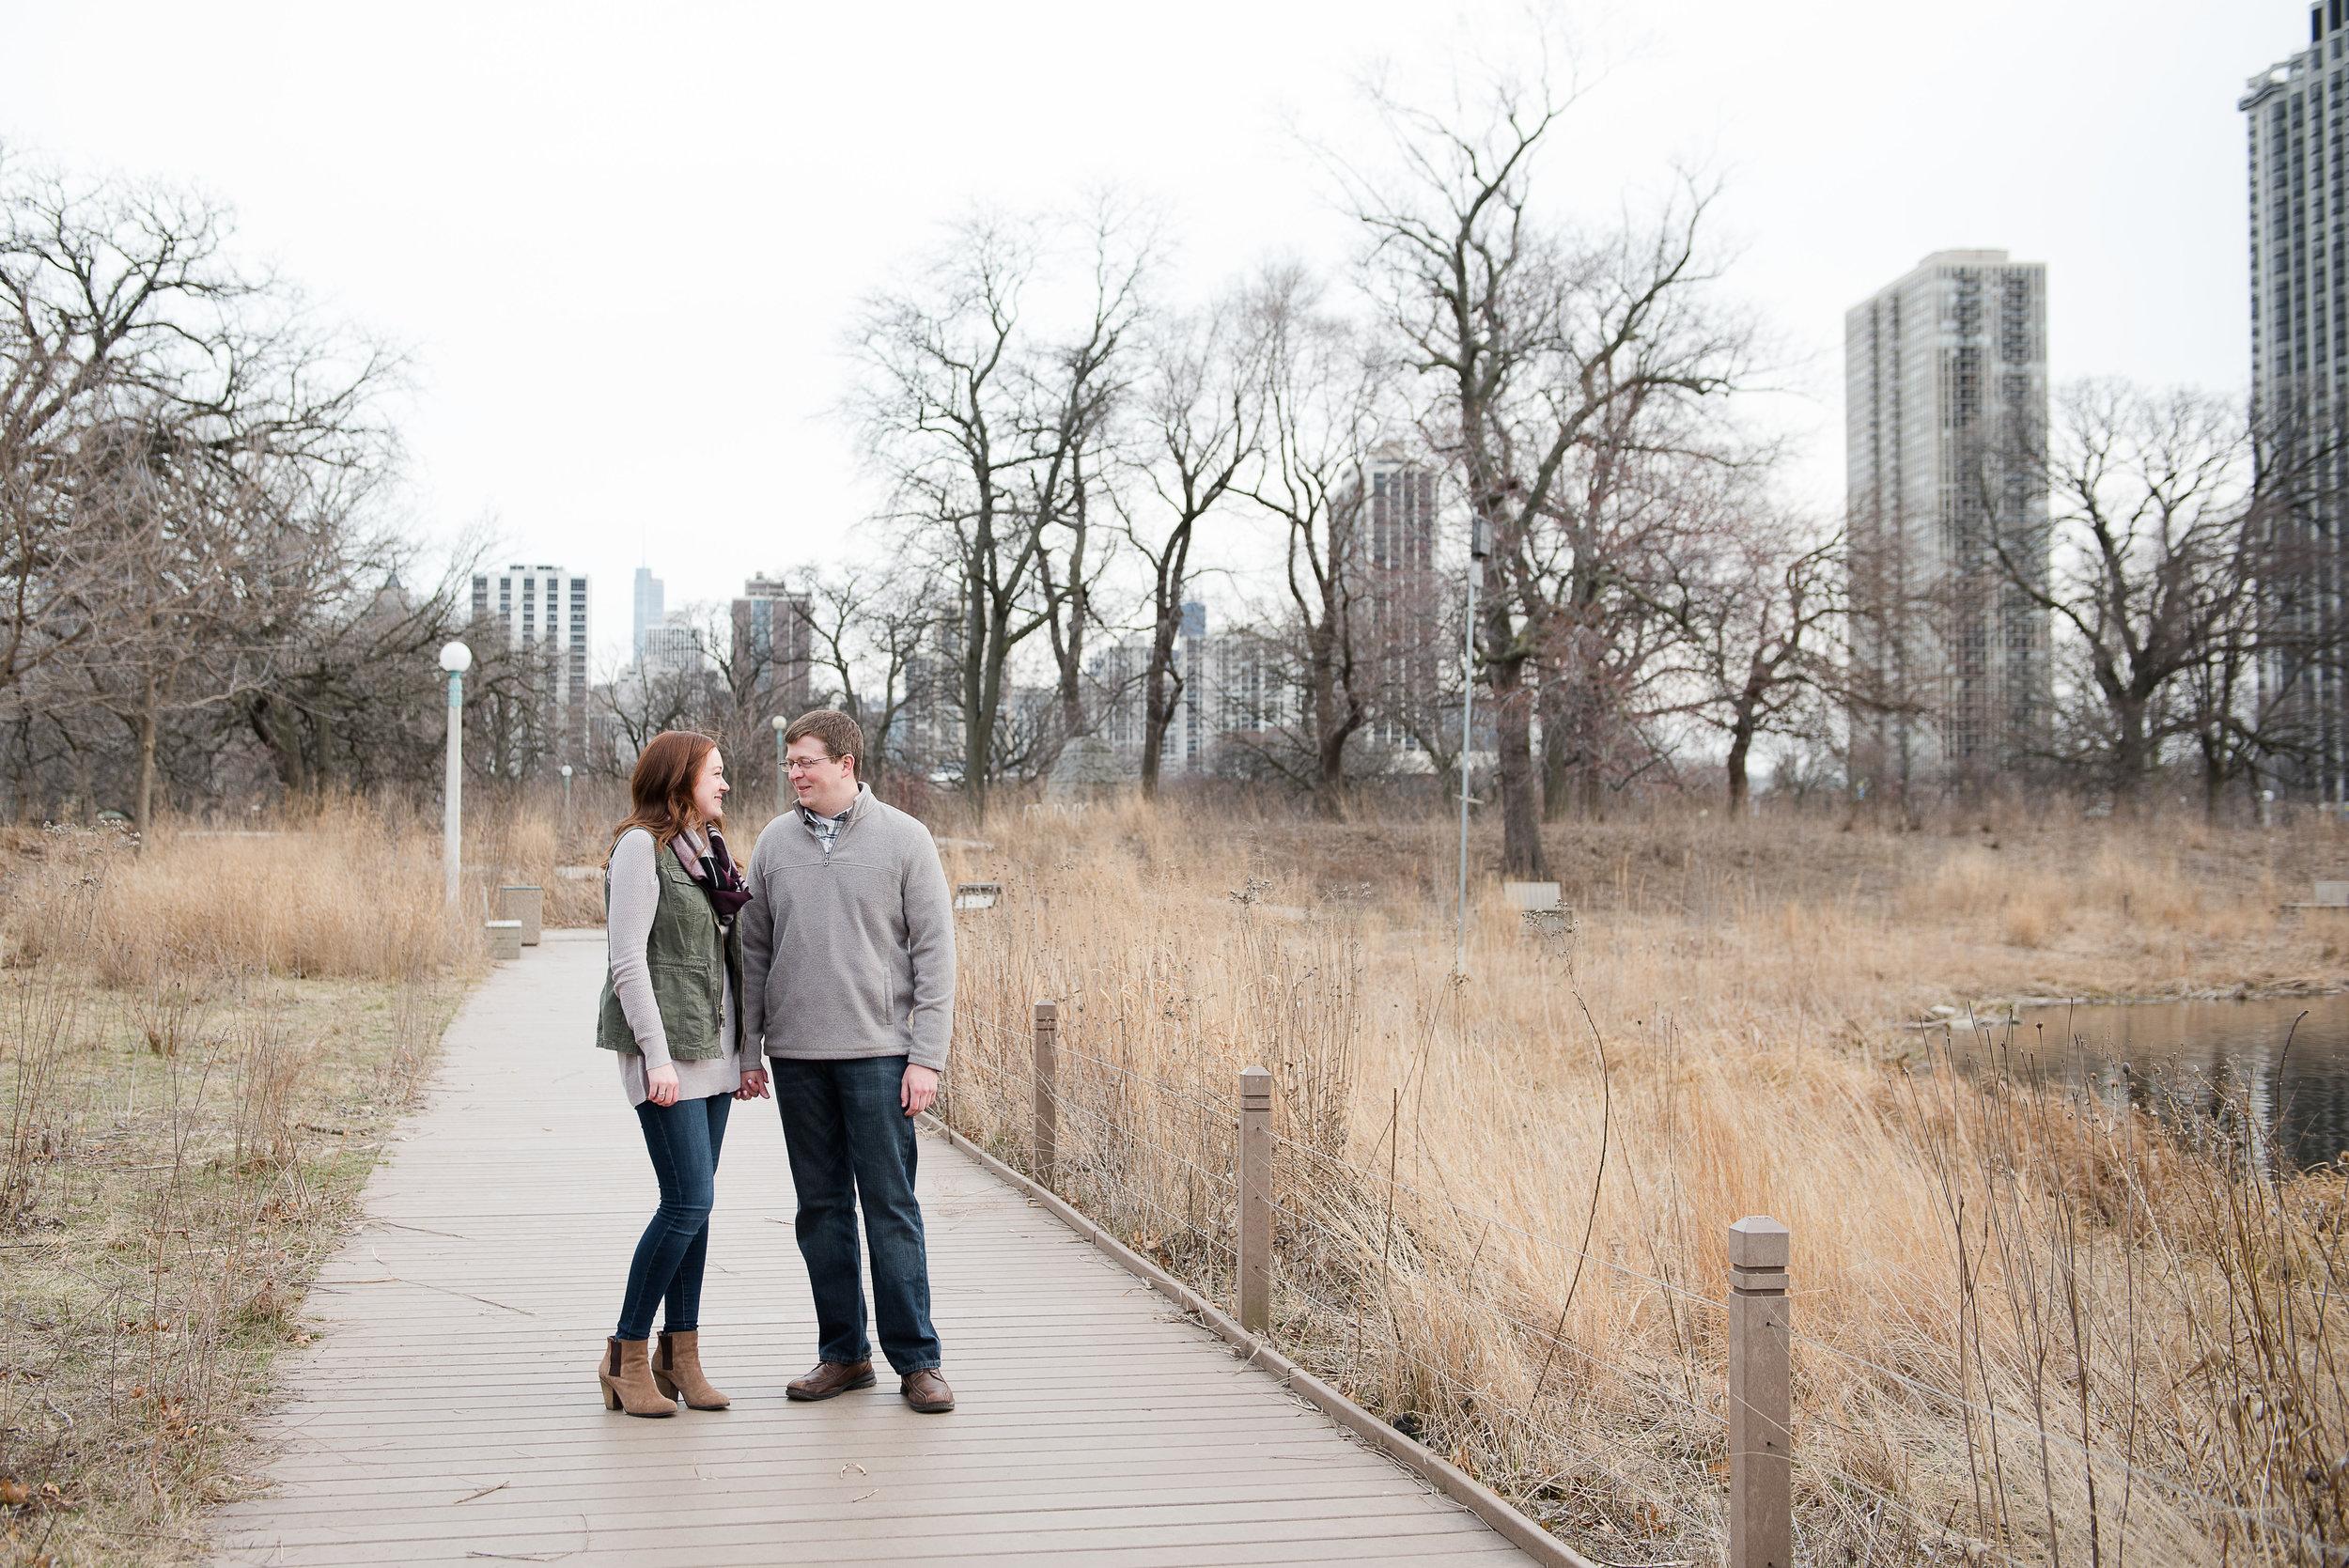 chicago-engagement-photography-metts-photo-3.jpg